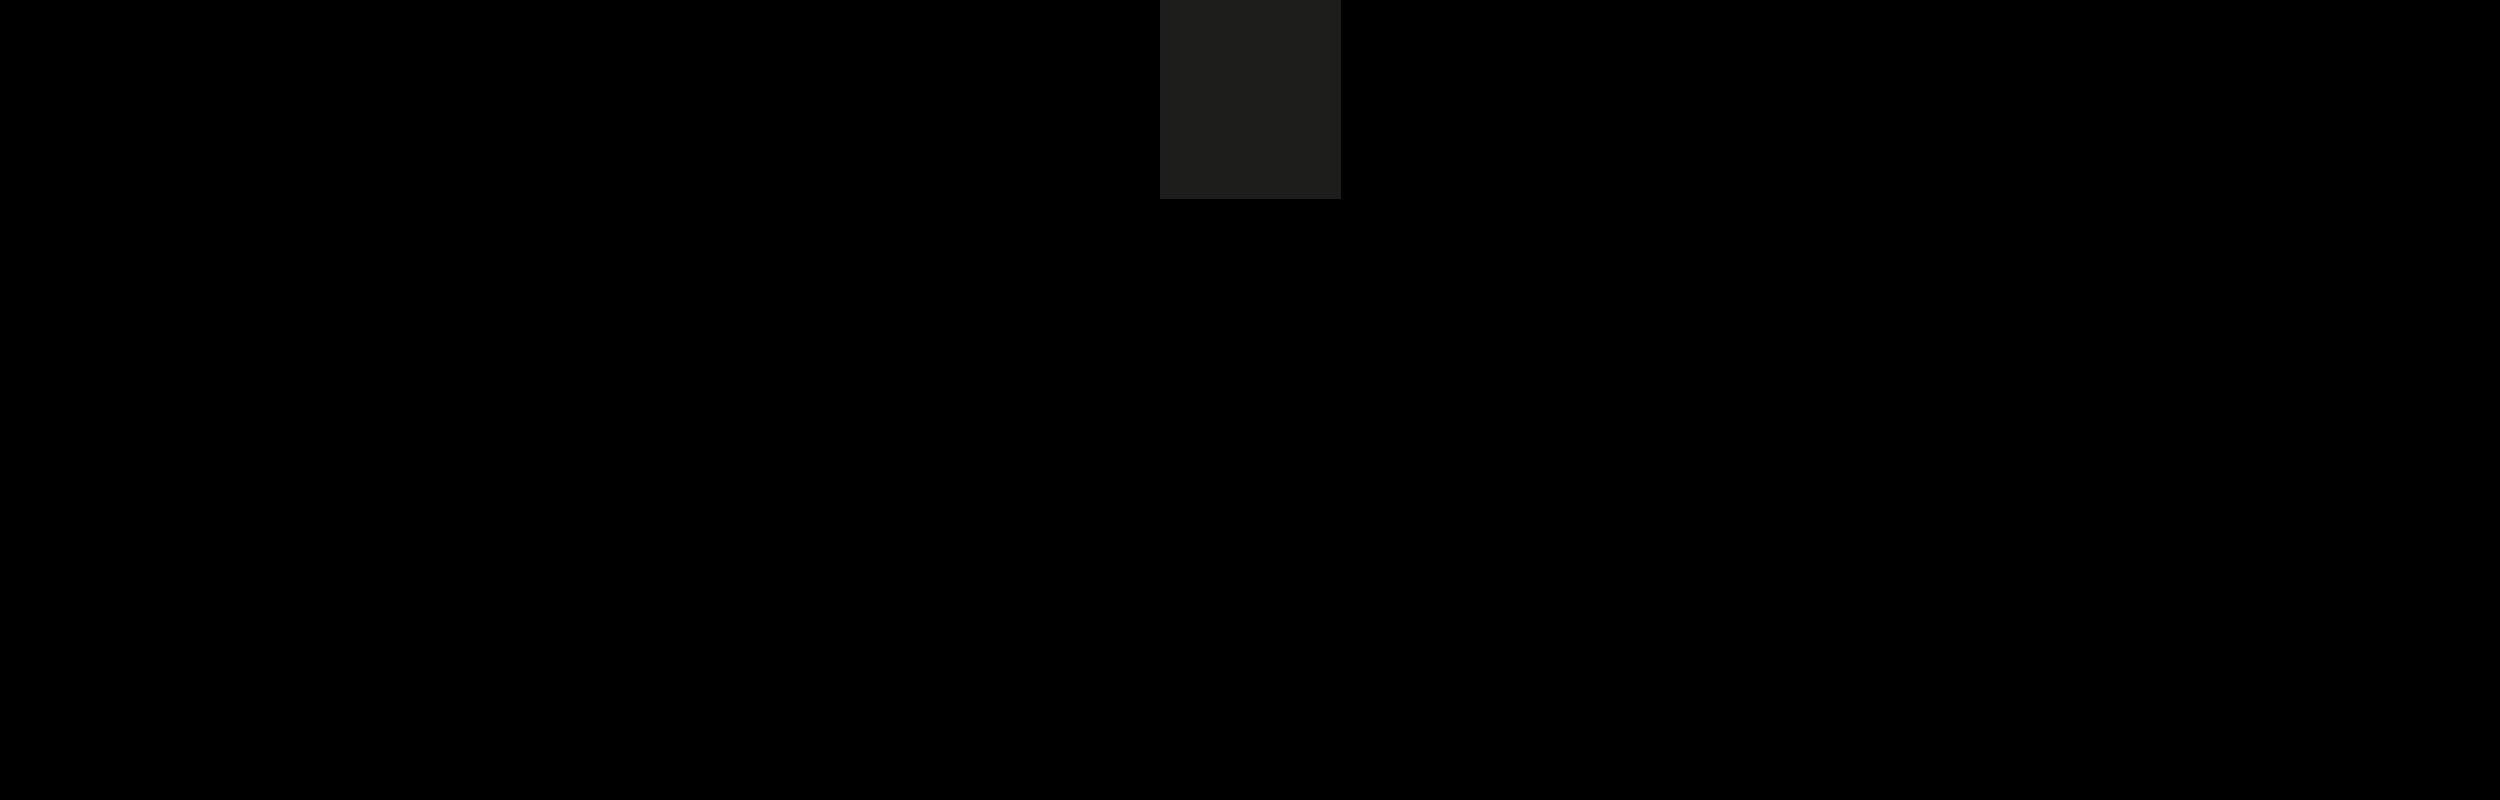 Echelon_symbol_svart.png